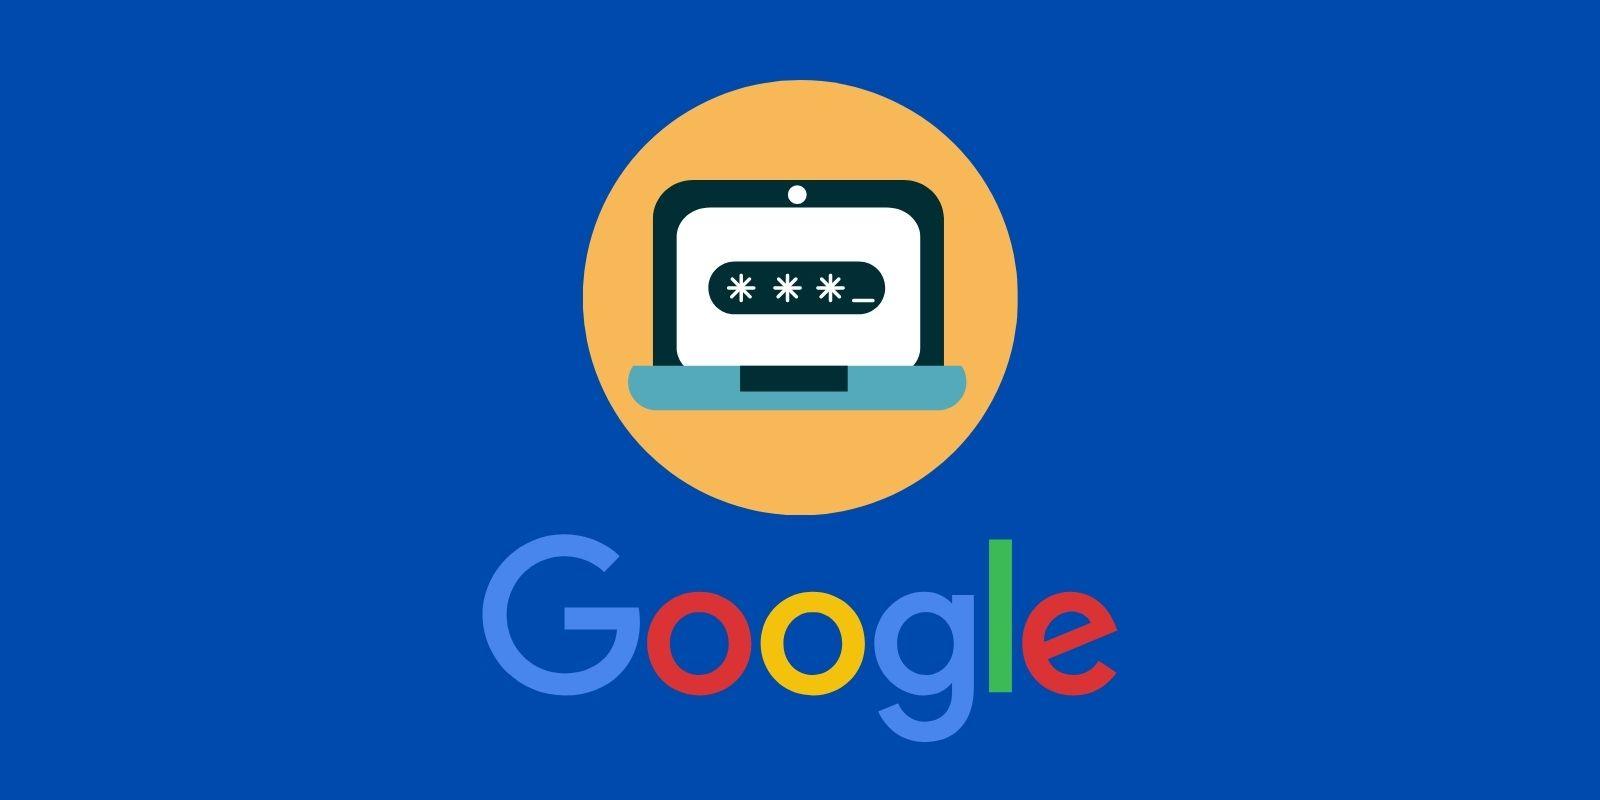 Google jelszavak